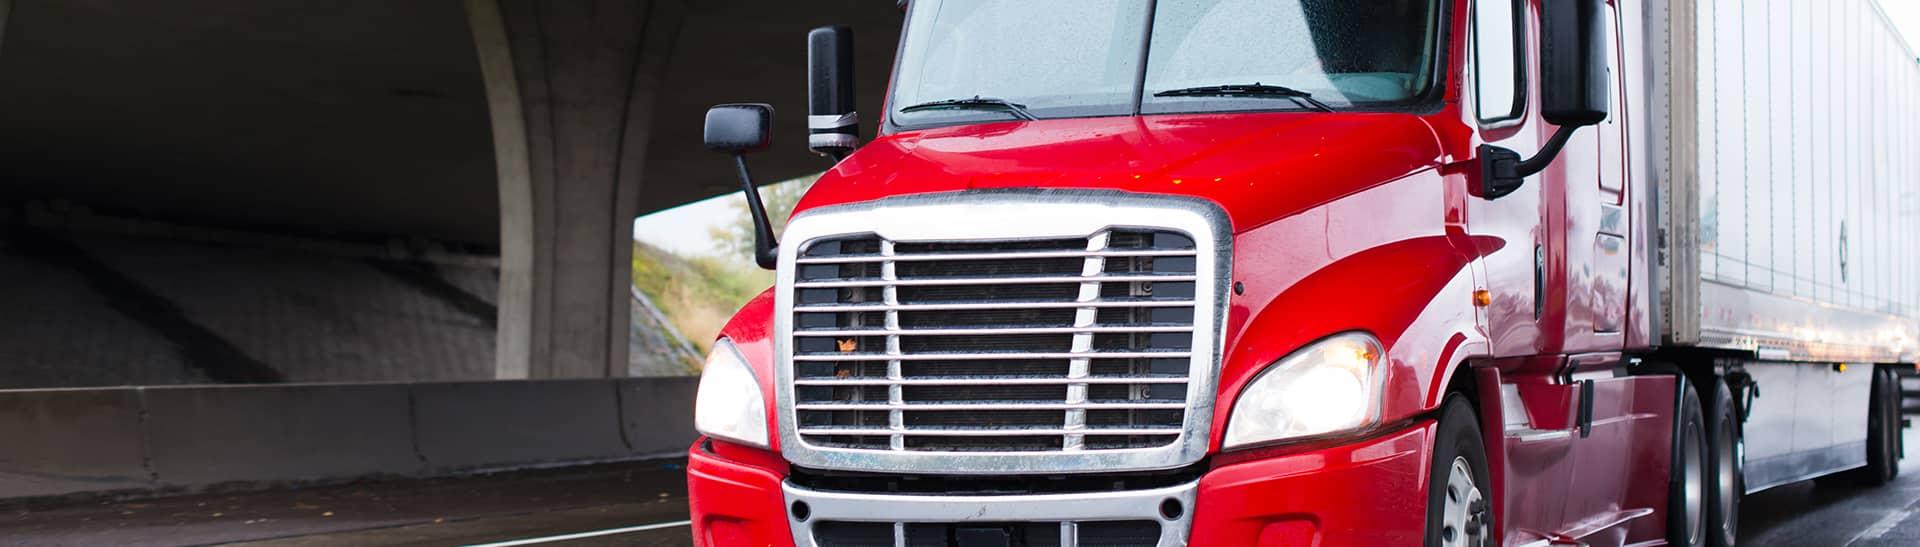 Burlington Trucking Company, Trucking Services and Transportation Logistics